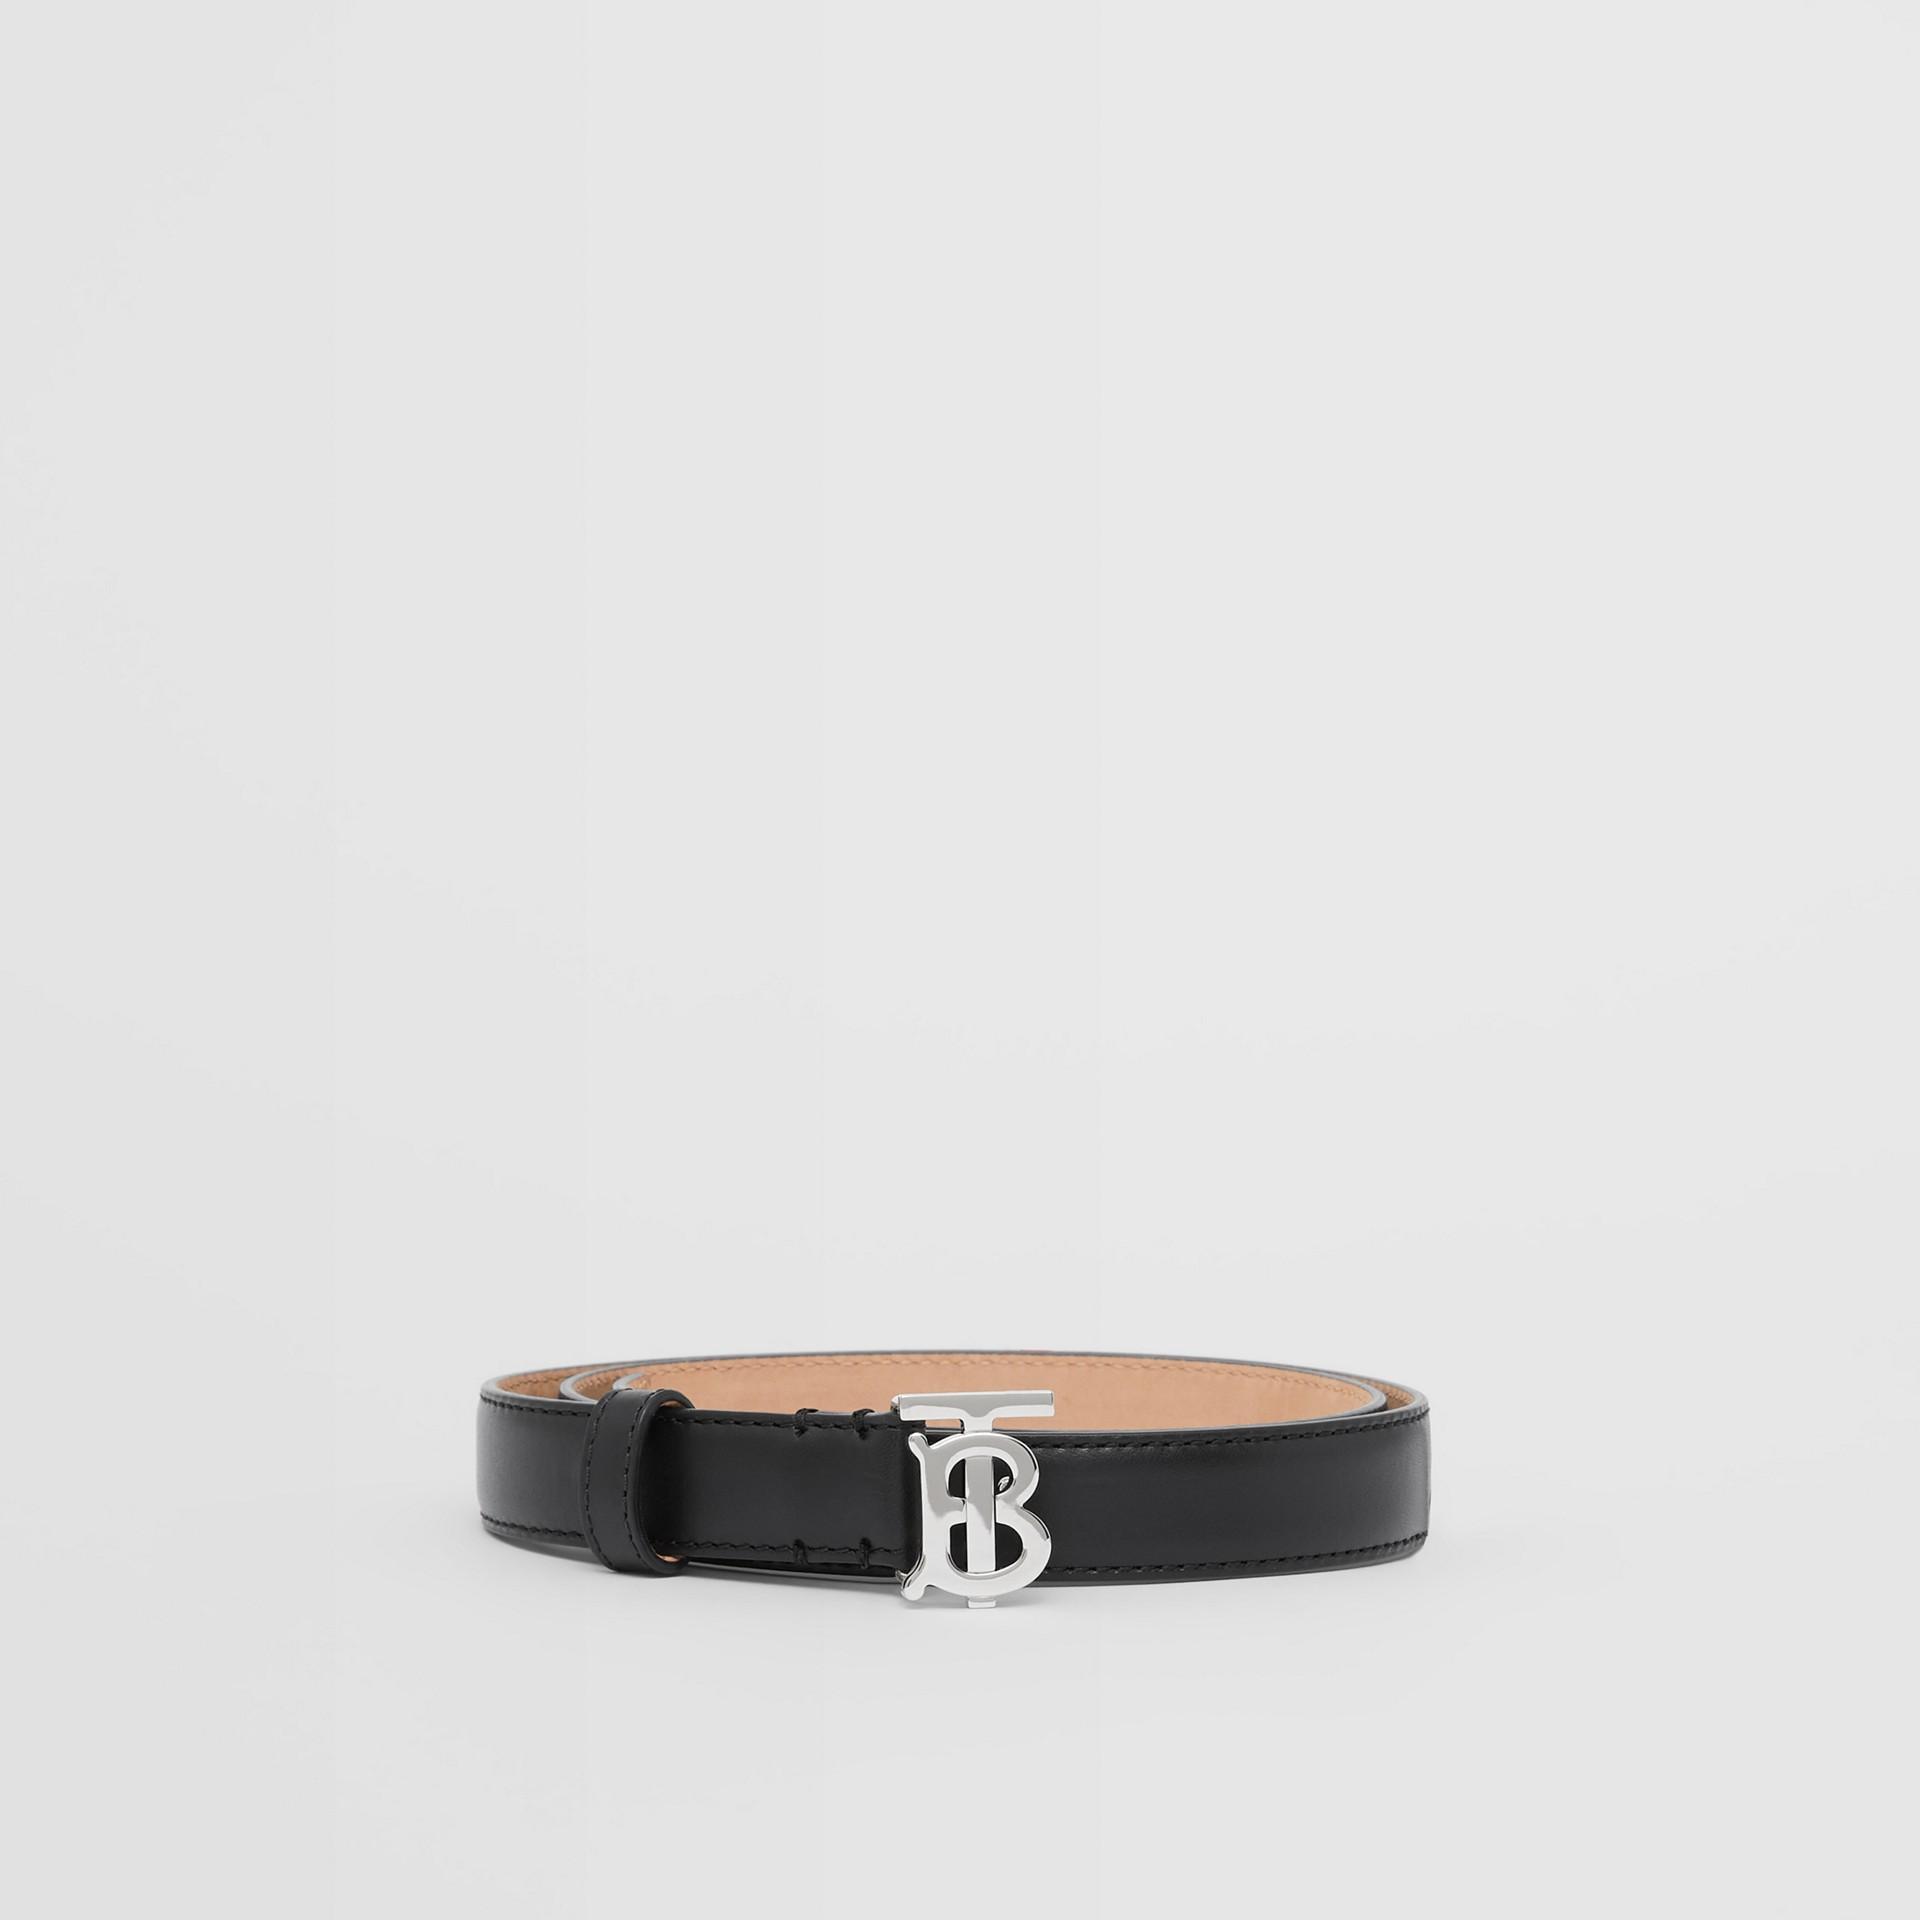 Monogram Motif Leather Belt in Black/palladio - Women | Burberry Canada - gallery image 3